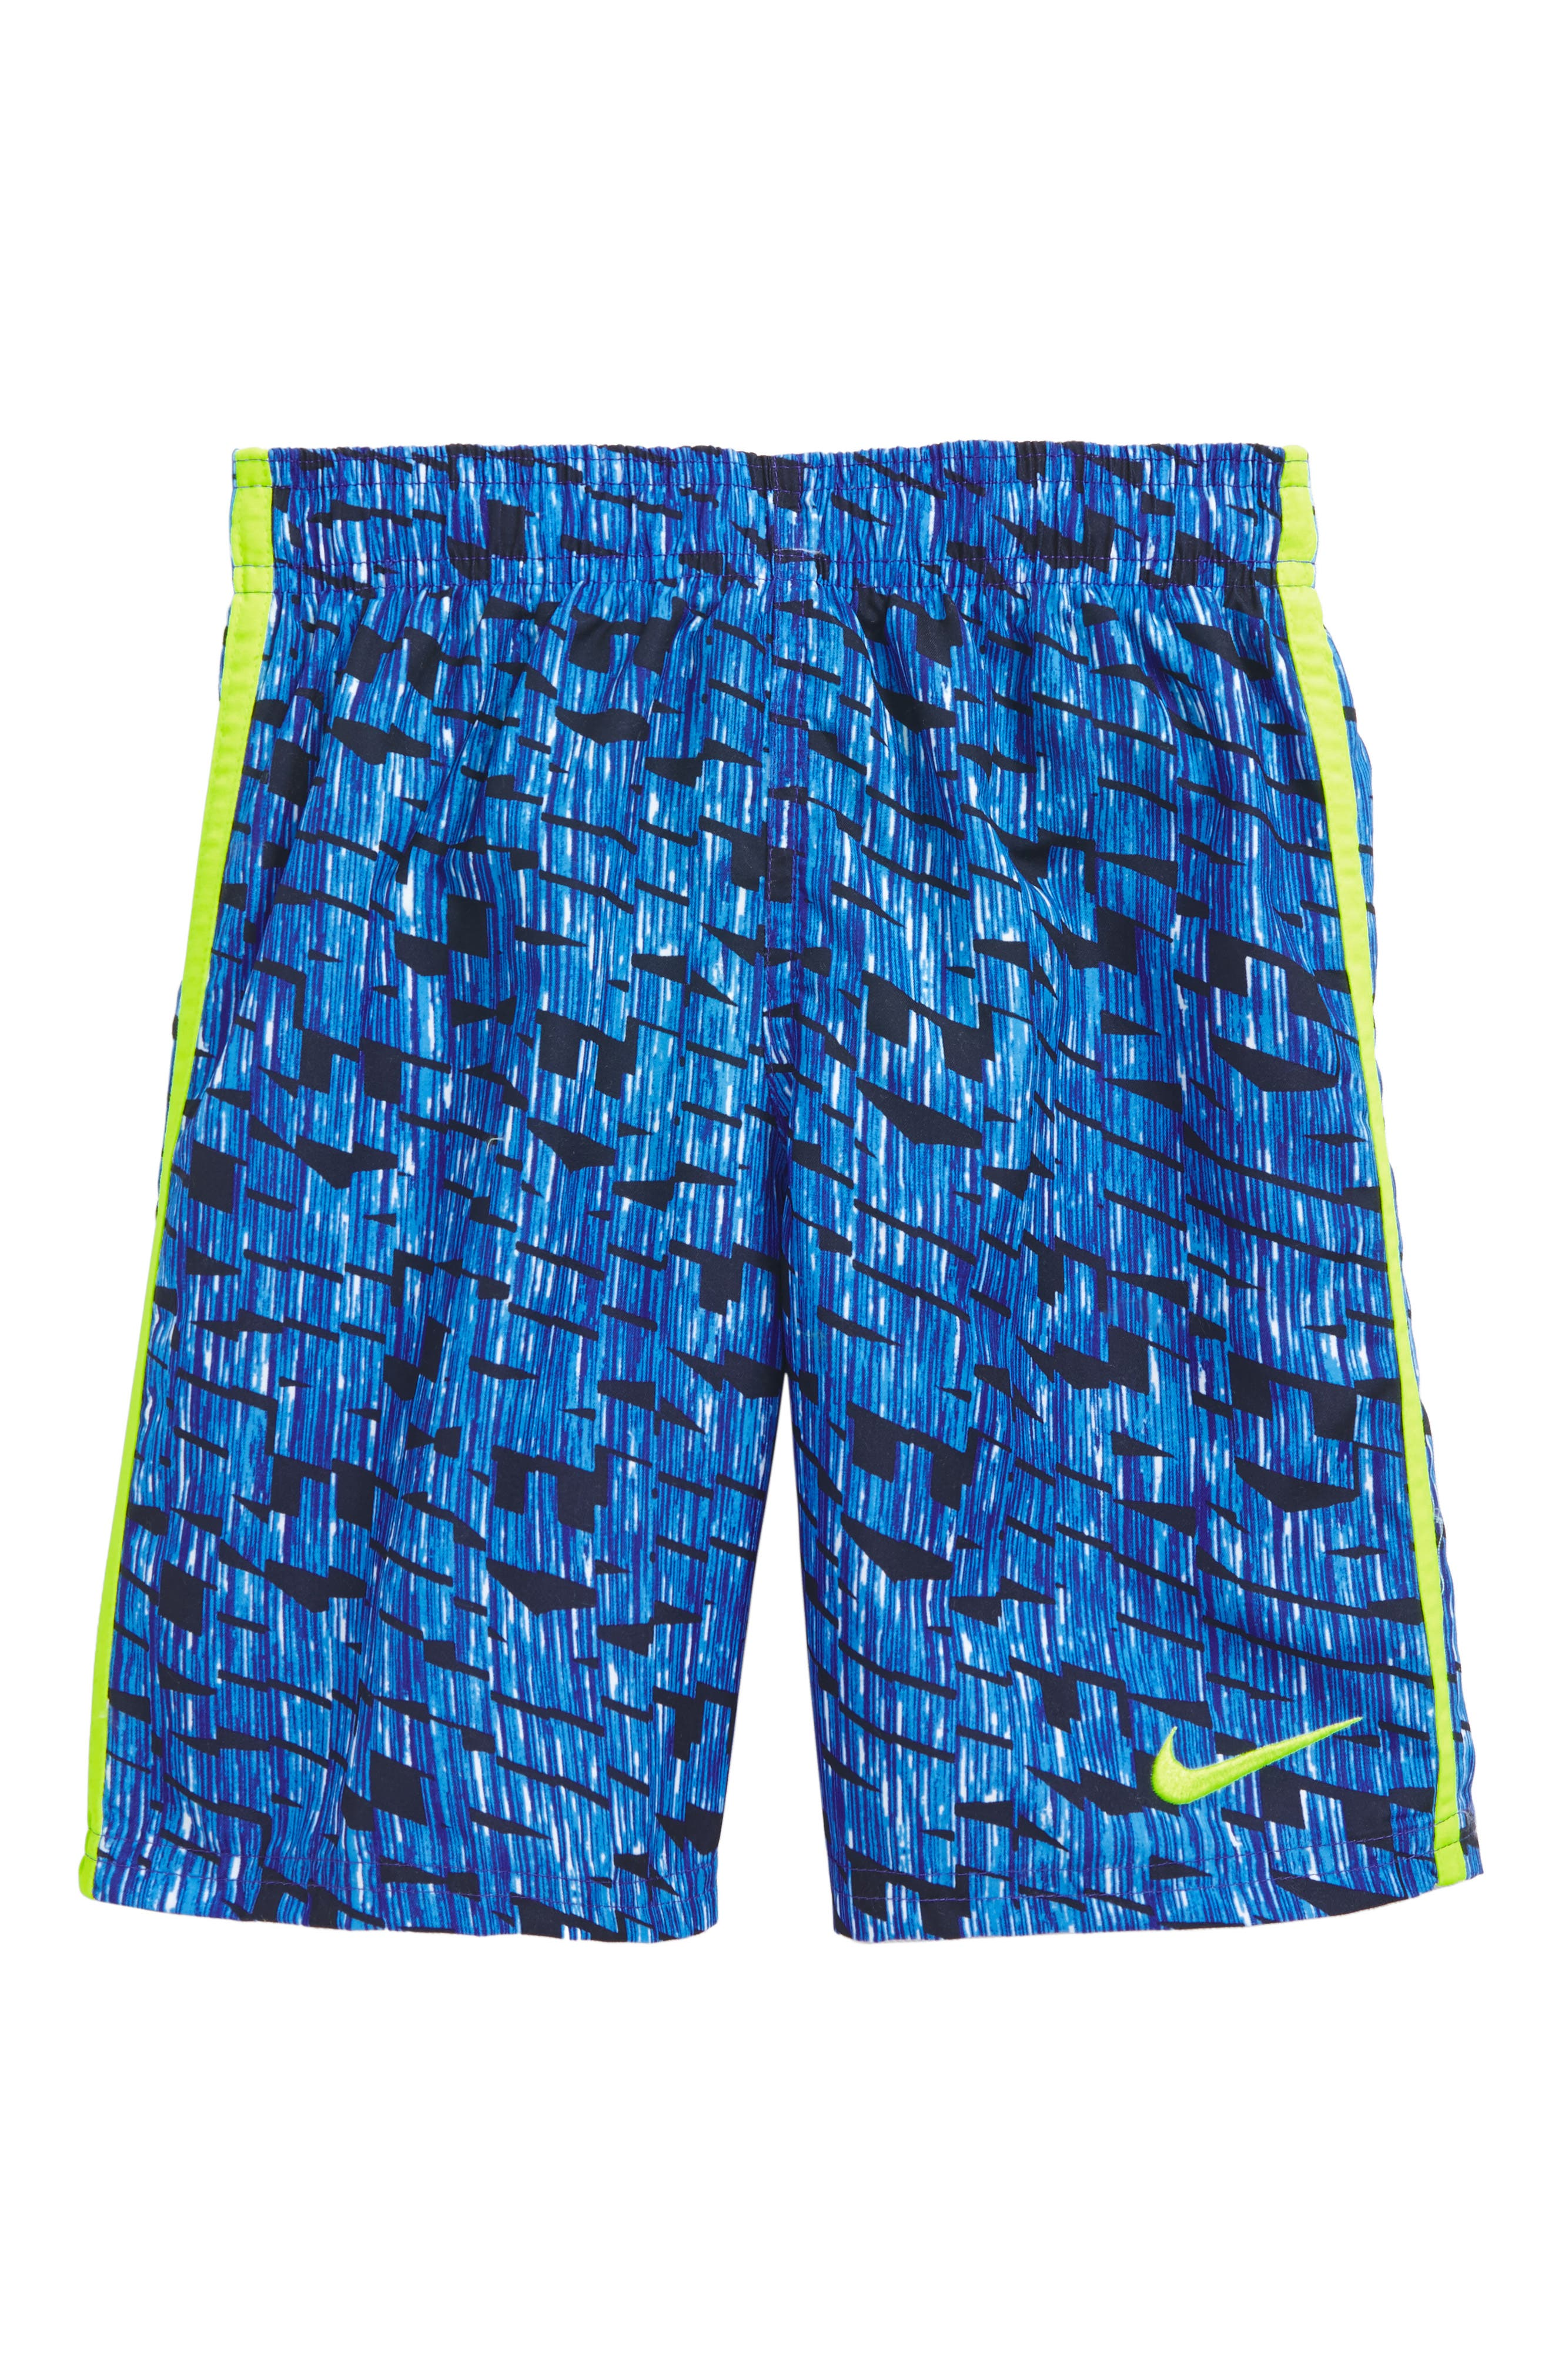 Diverge Board Shorts,                         Main,                         color, Hyper Royal